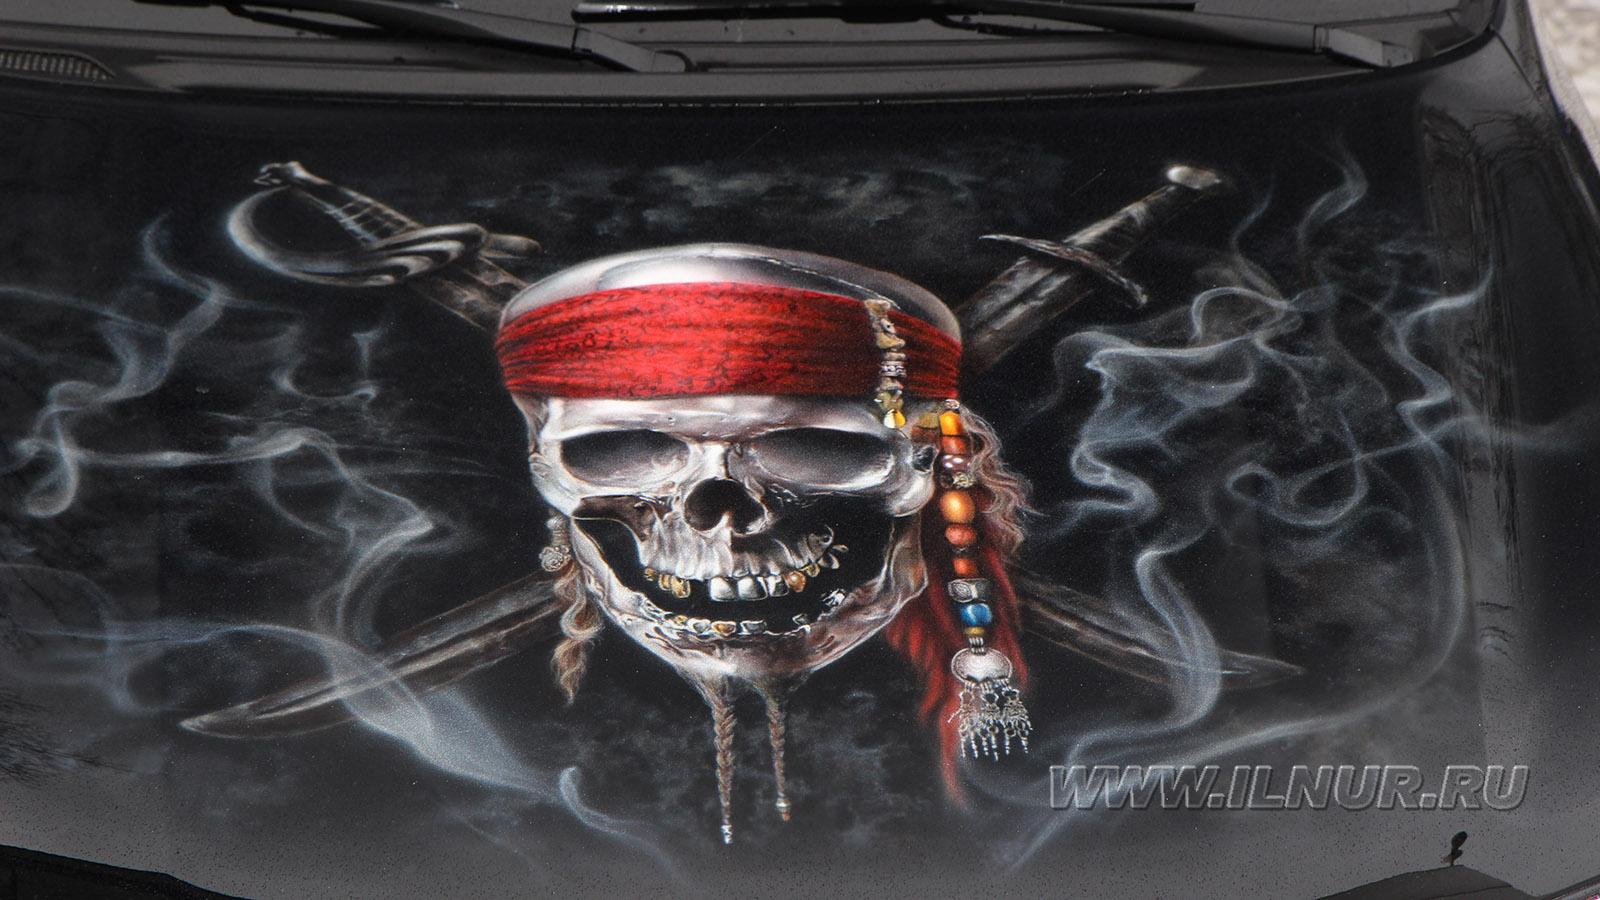 Пираты 200-го кузова